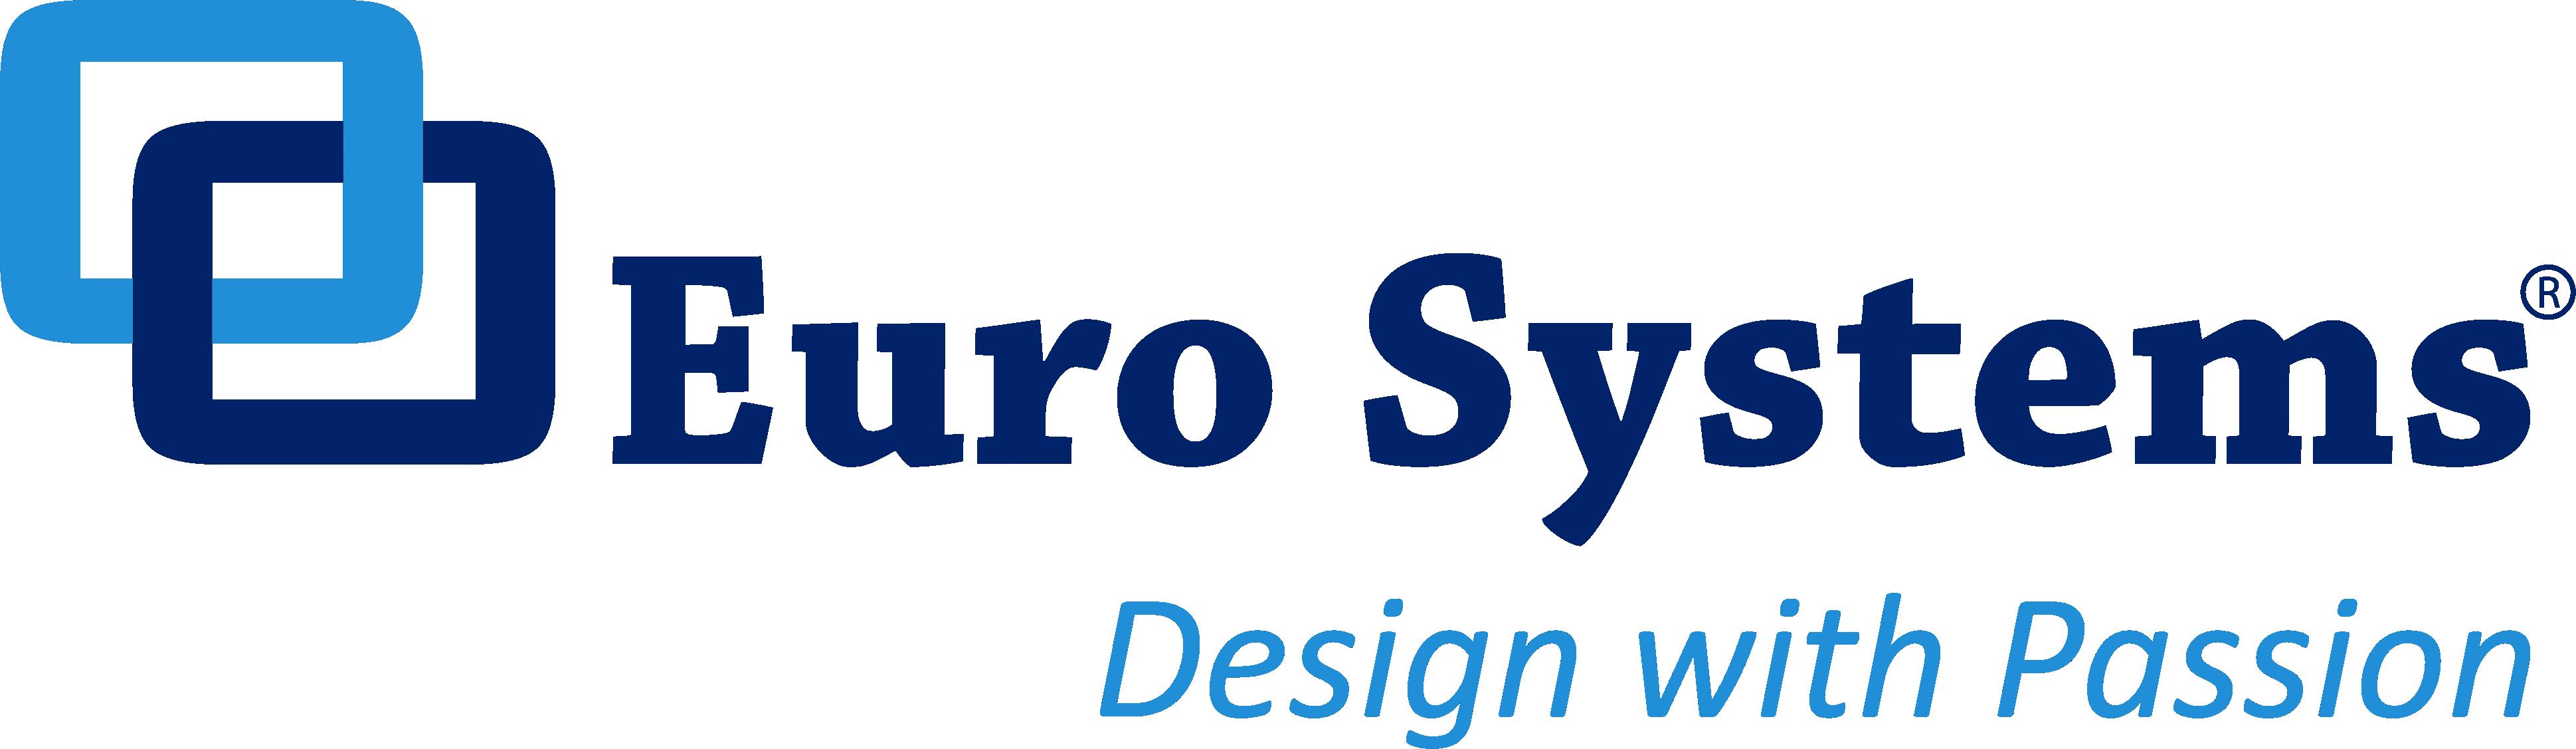 EuroSystemsLogo_PNG.png